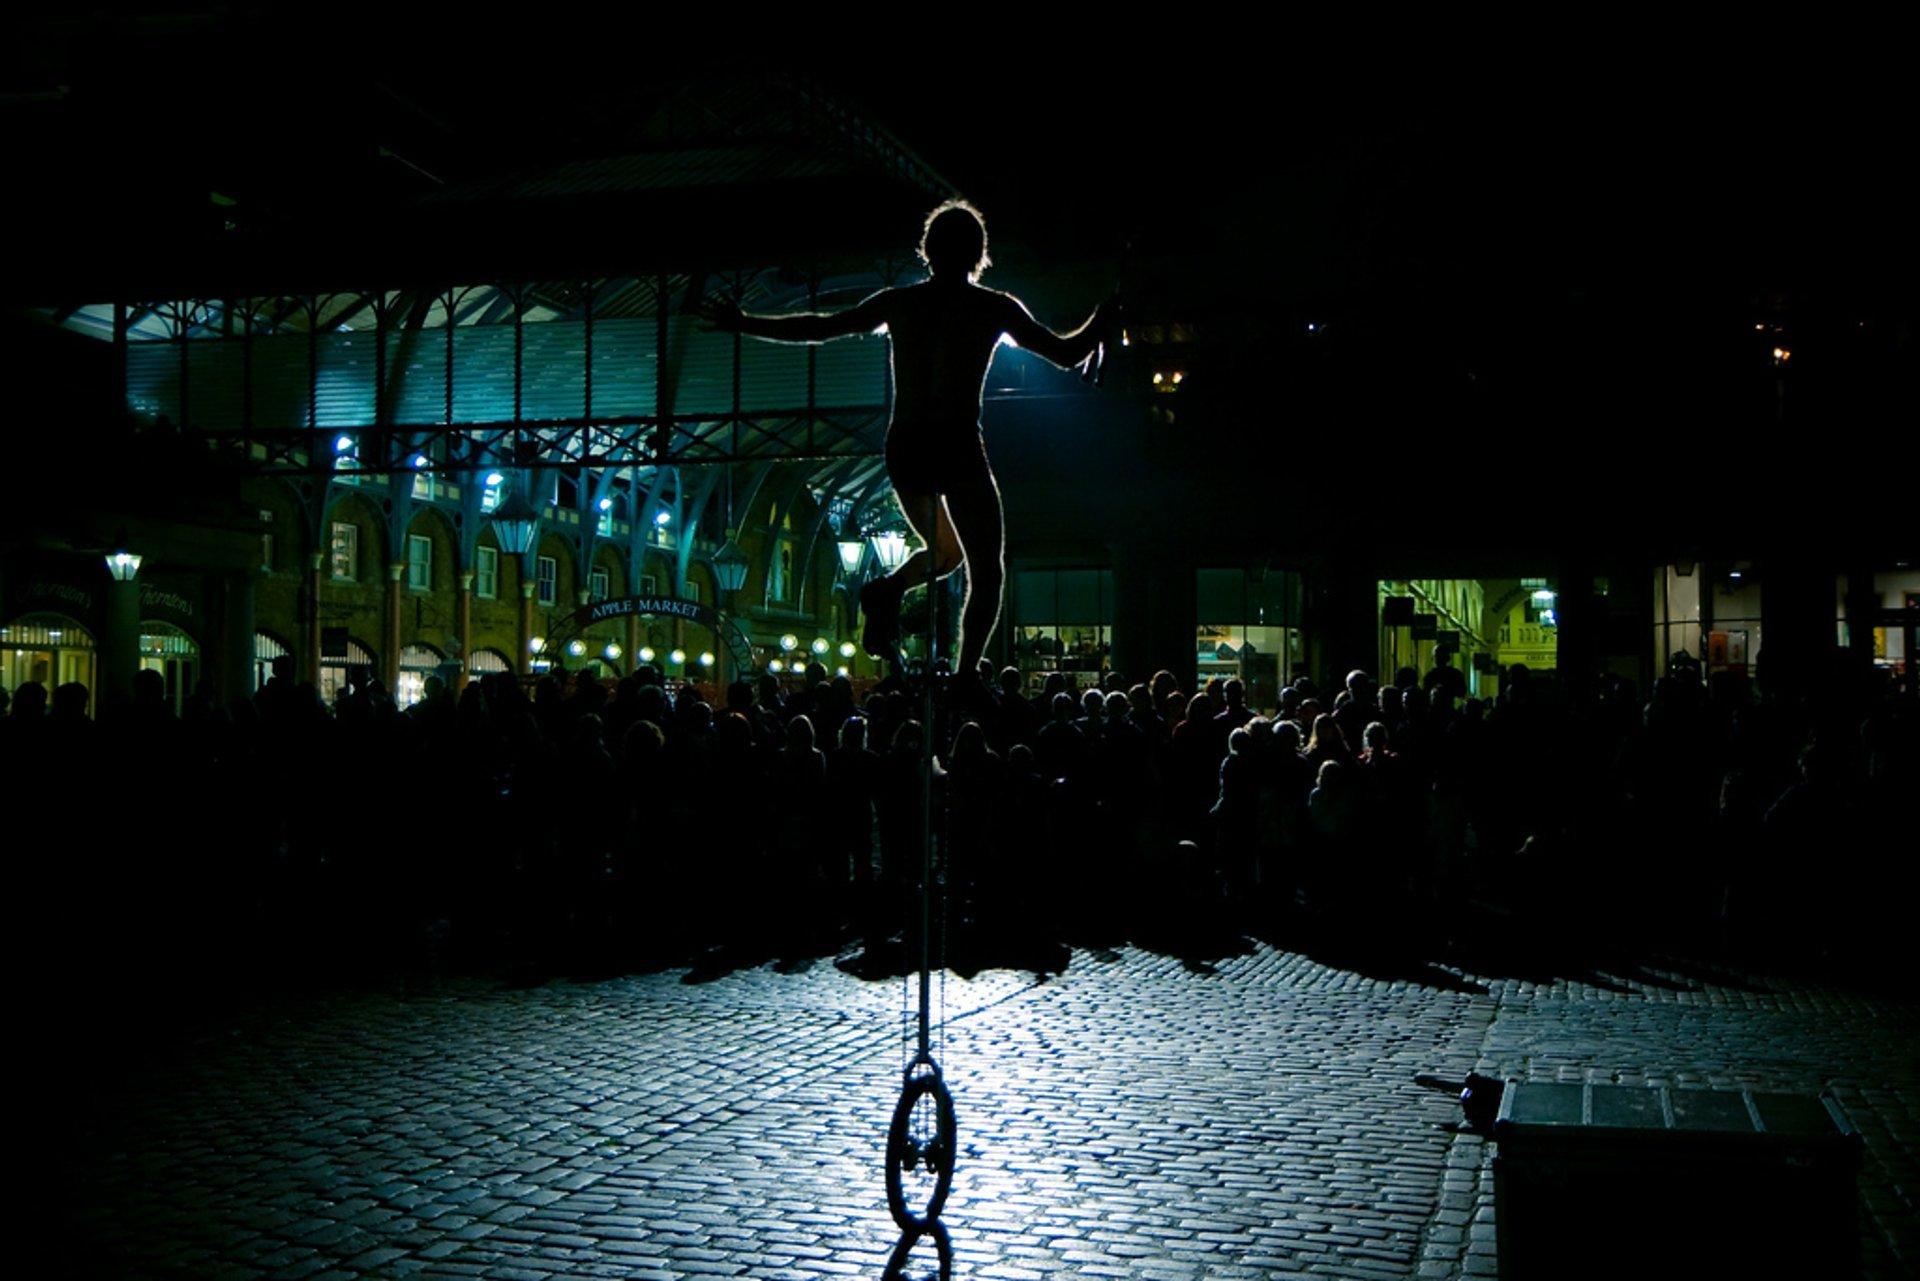 Street Performances in London 2019 - Best Time